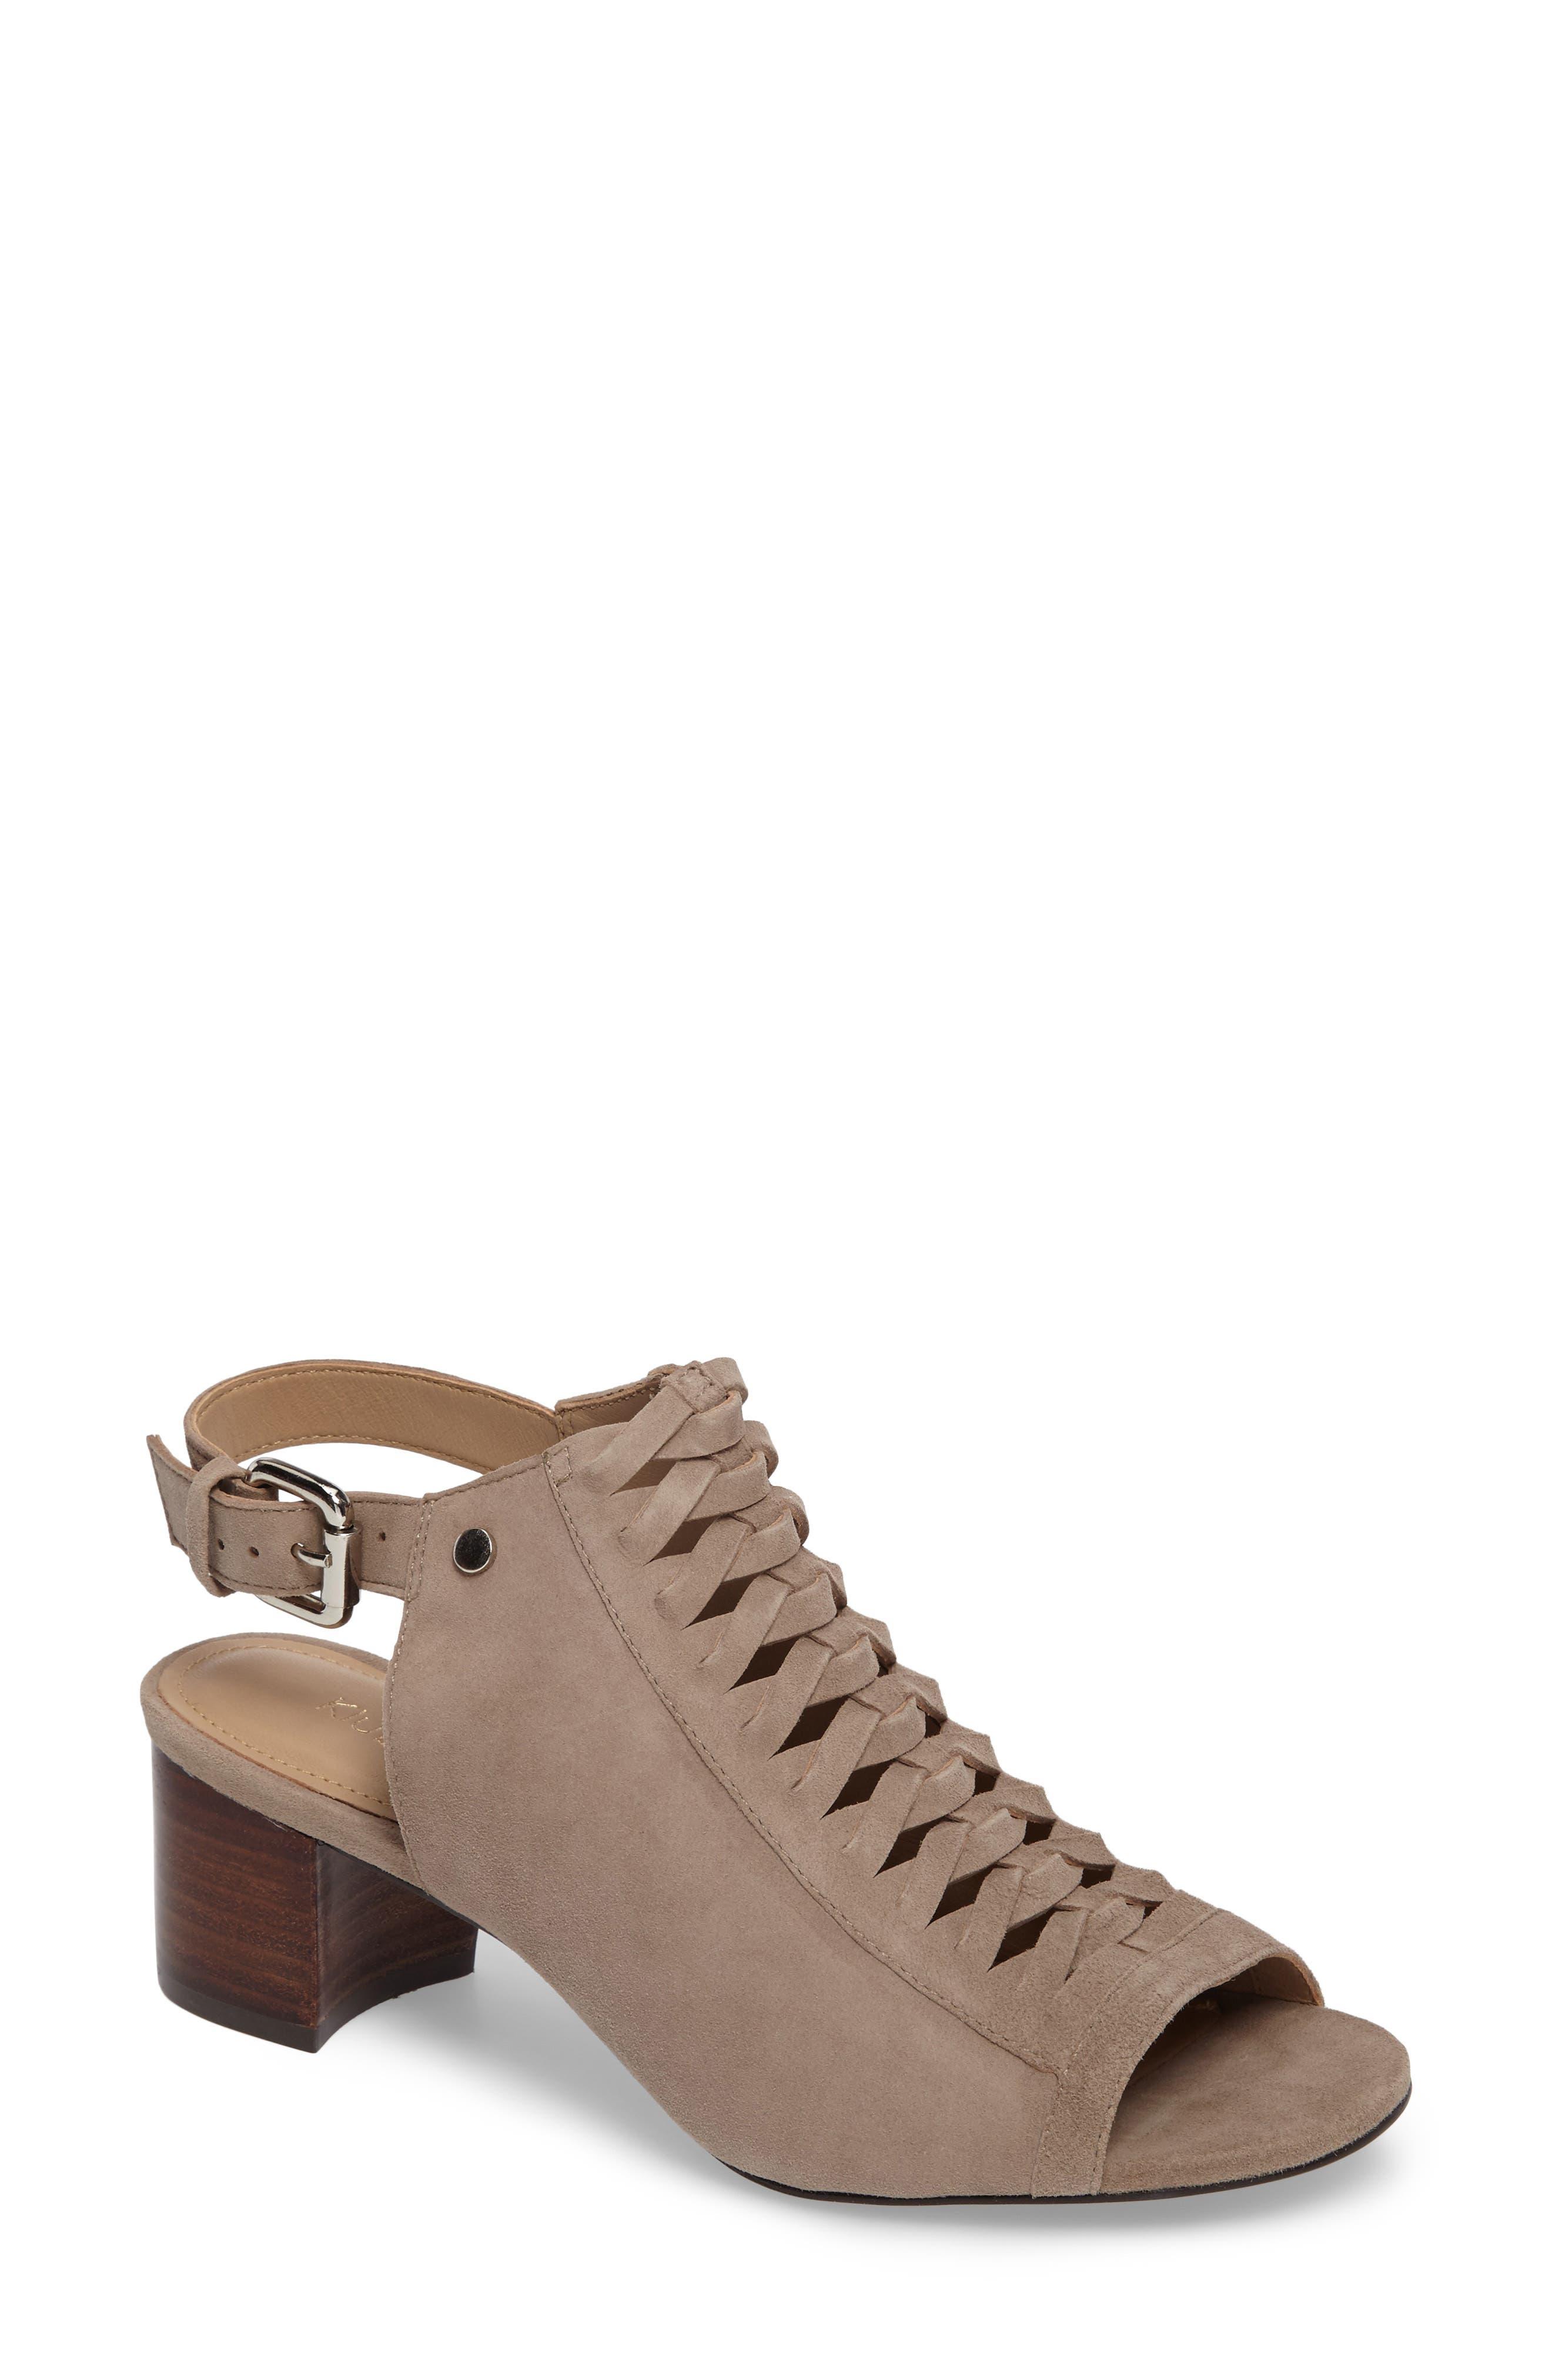 Dallas Woven Sandal,                         Main,                         color, TAUPE SUEDE